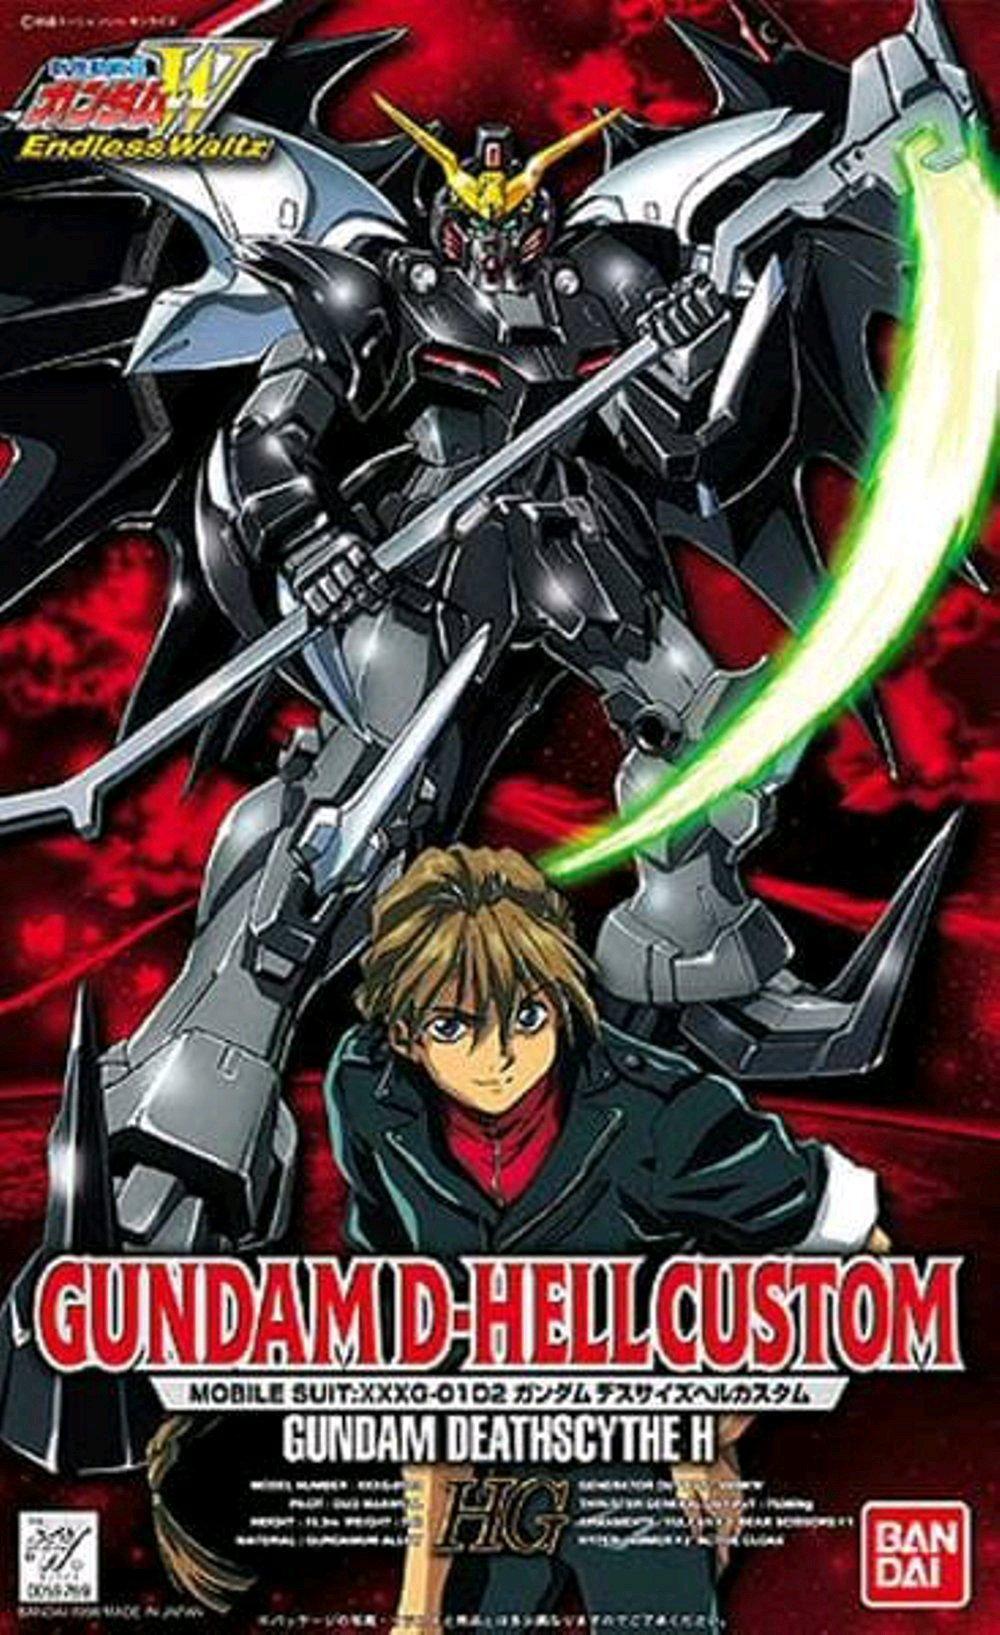 HG 1/100 EW-5 XXXG-01D2 ガンダムデスサイズヘルカスタム [Gundam D-Hell Custom]